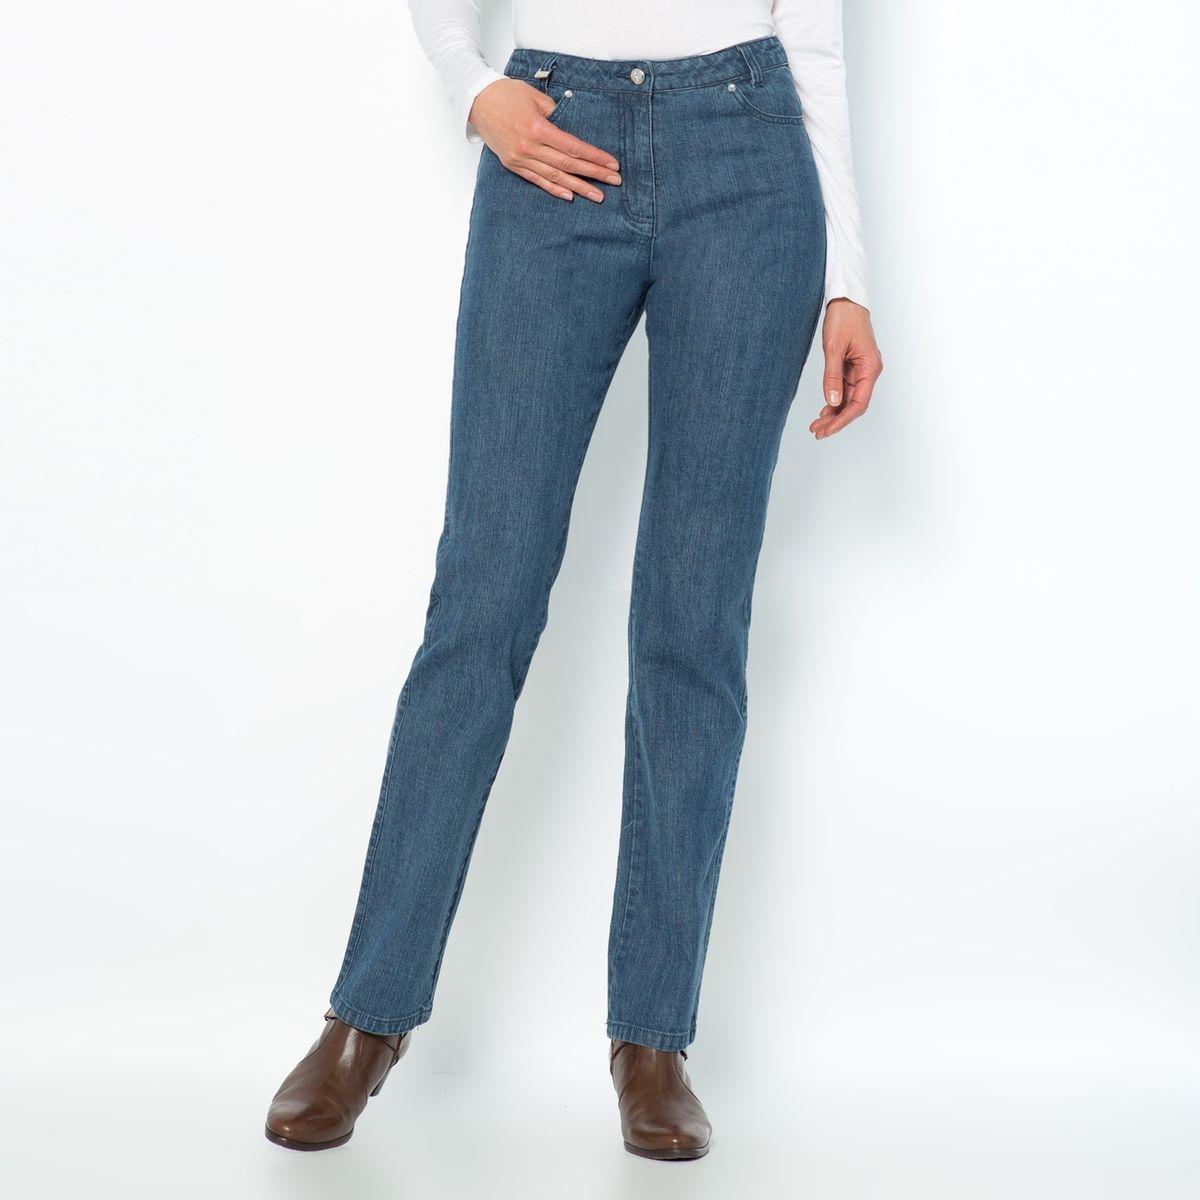 jeans La Redoute